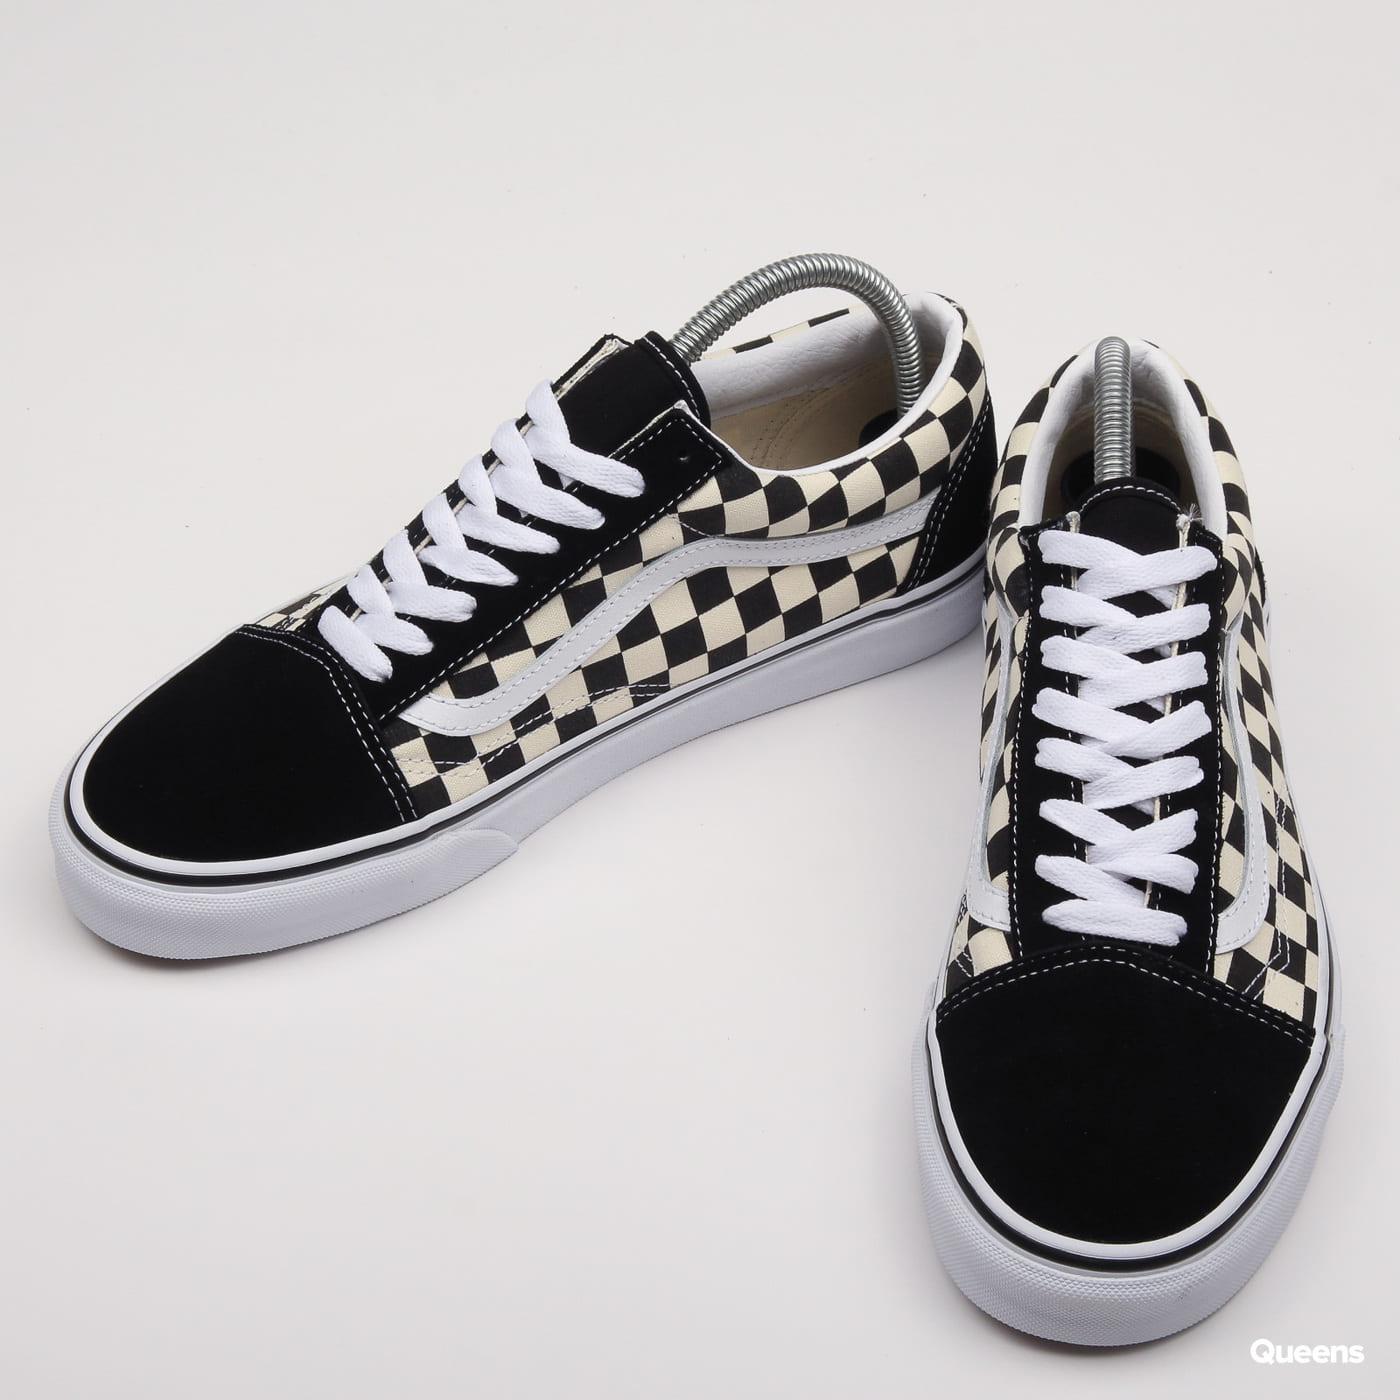 Vans Old Skool (primary check) black / white